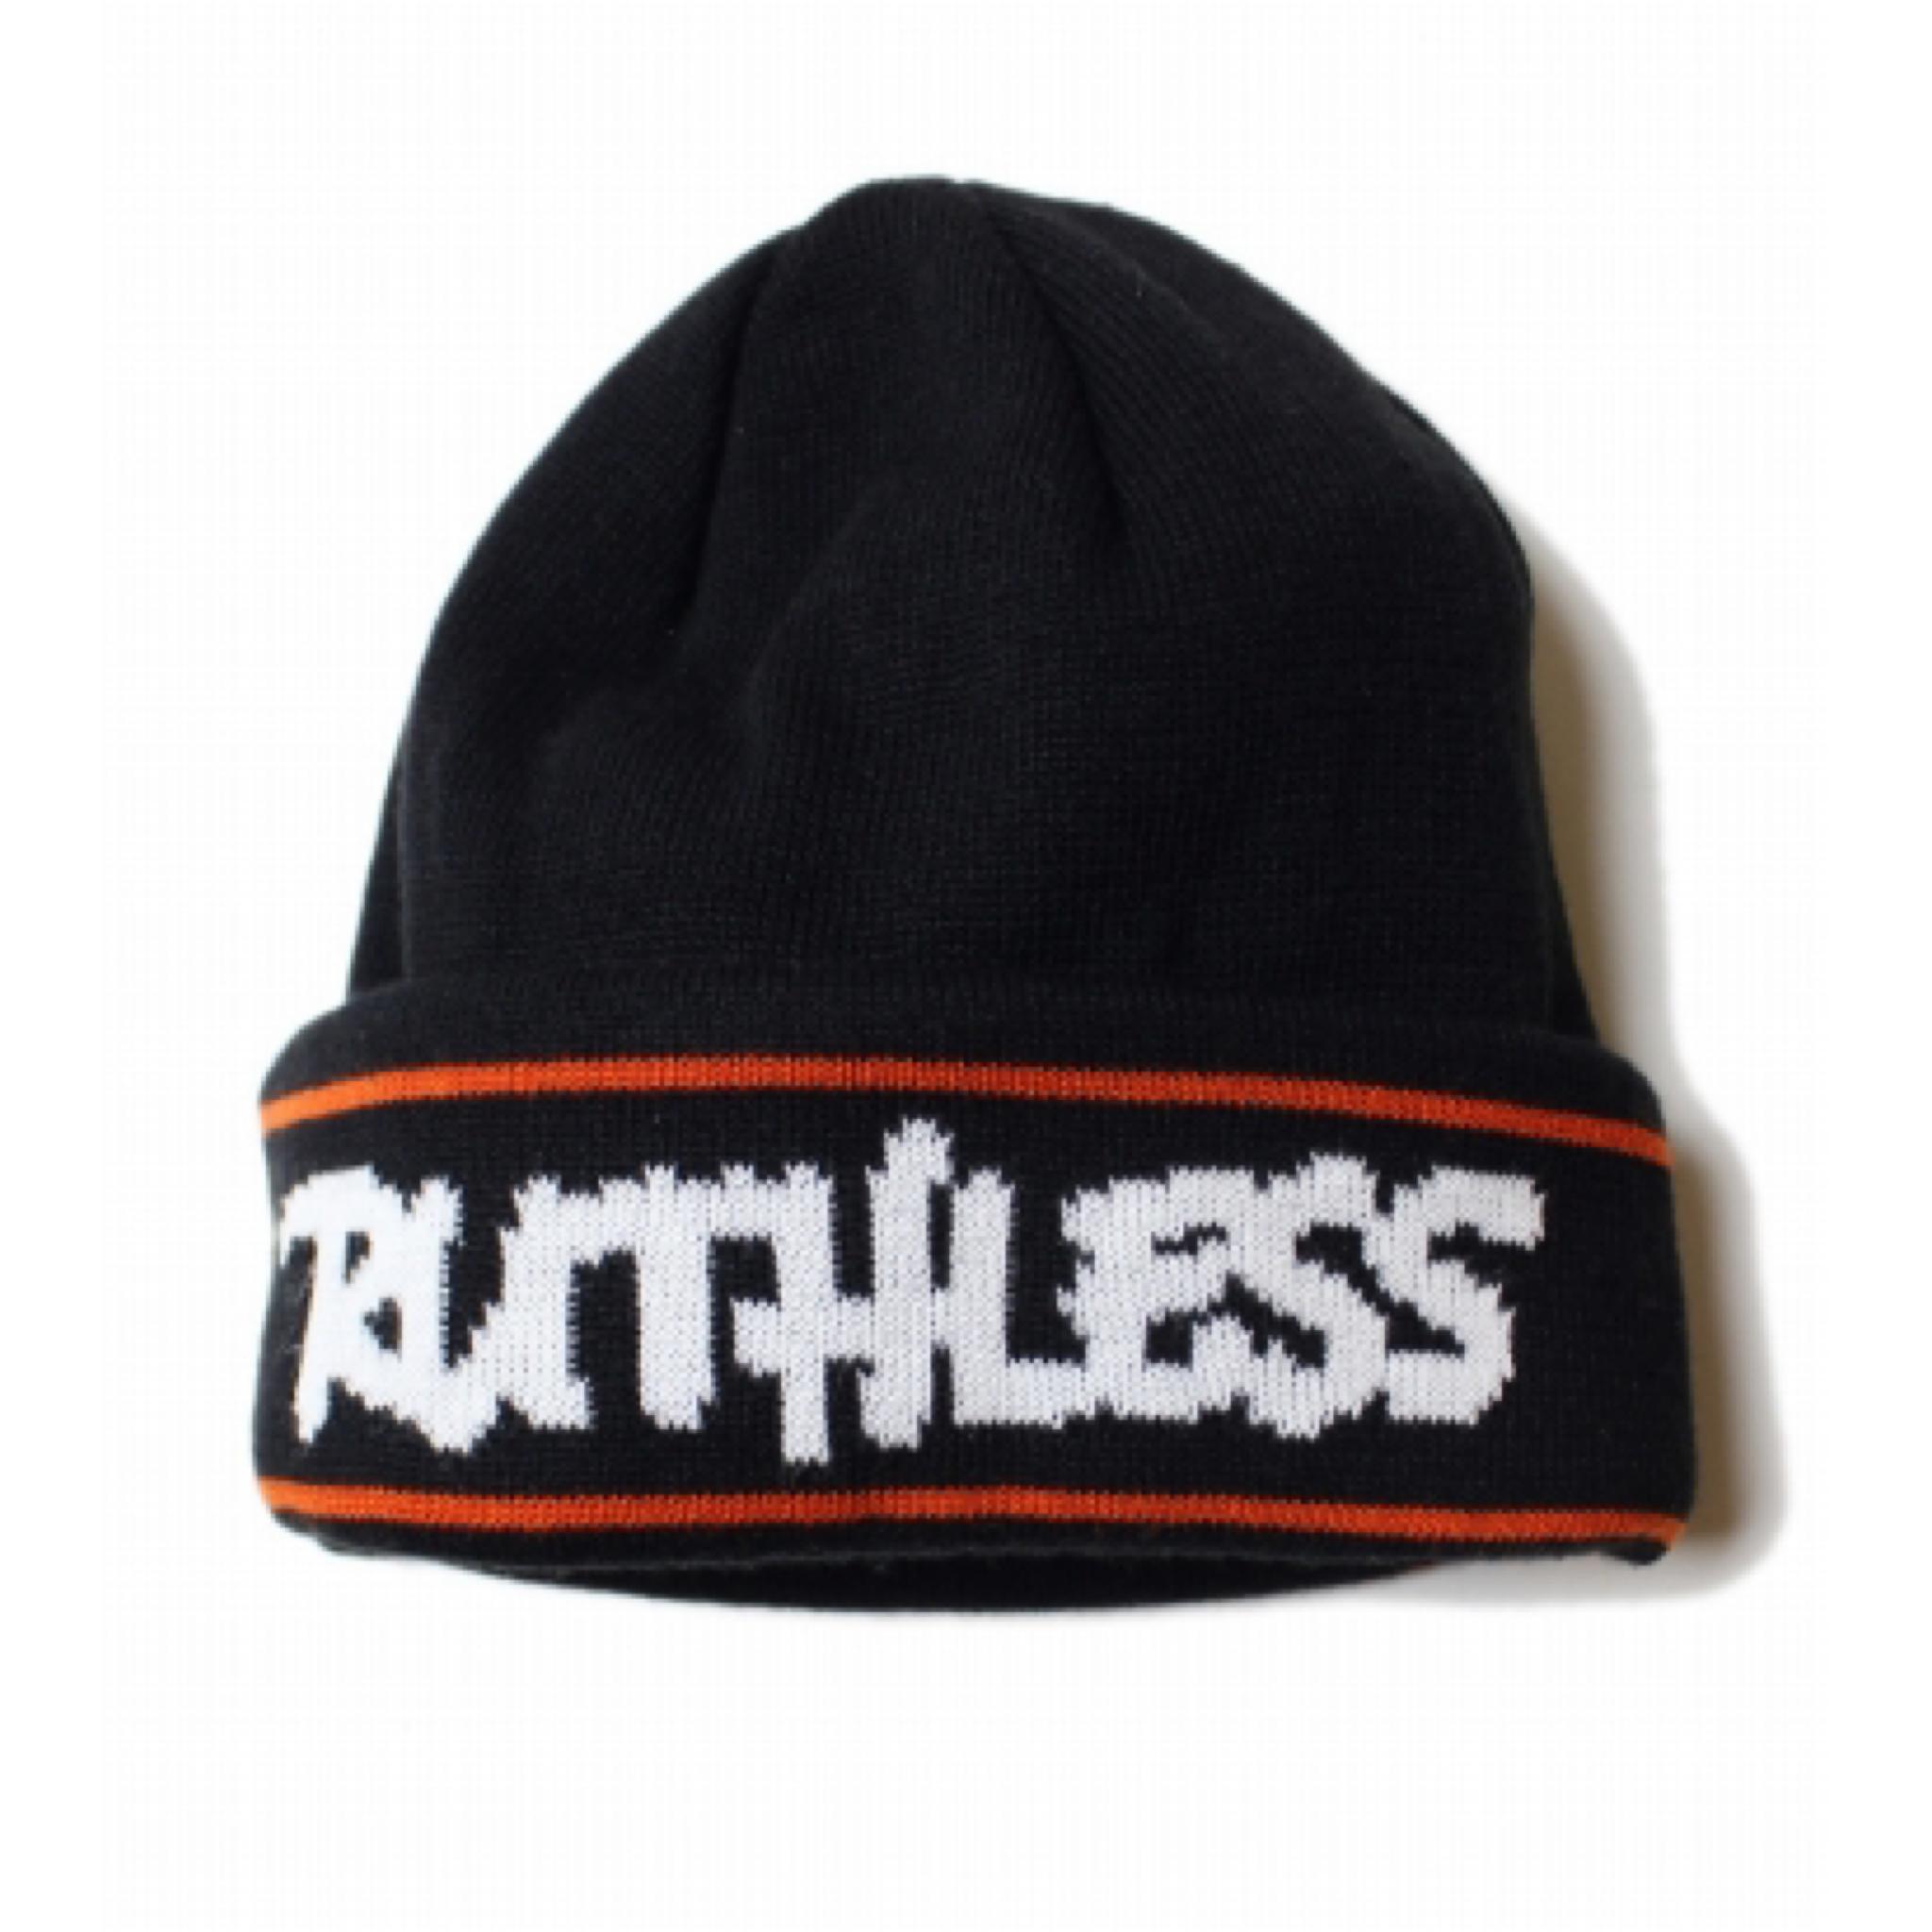 RUTHLESS #HD Knit Cap Black